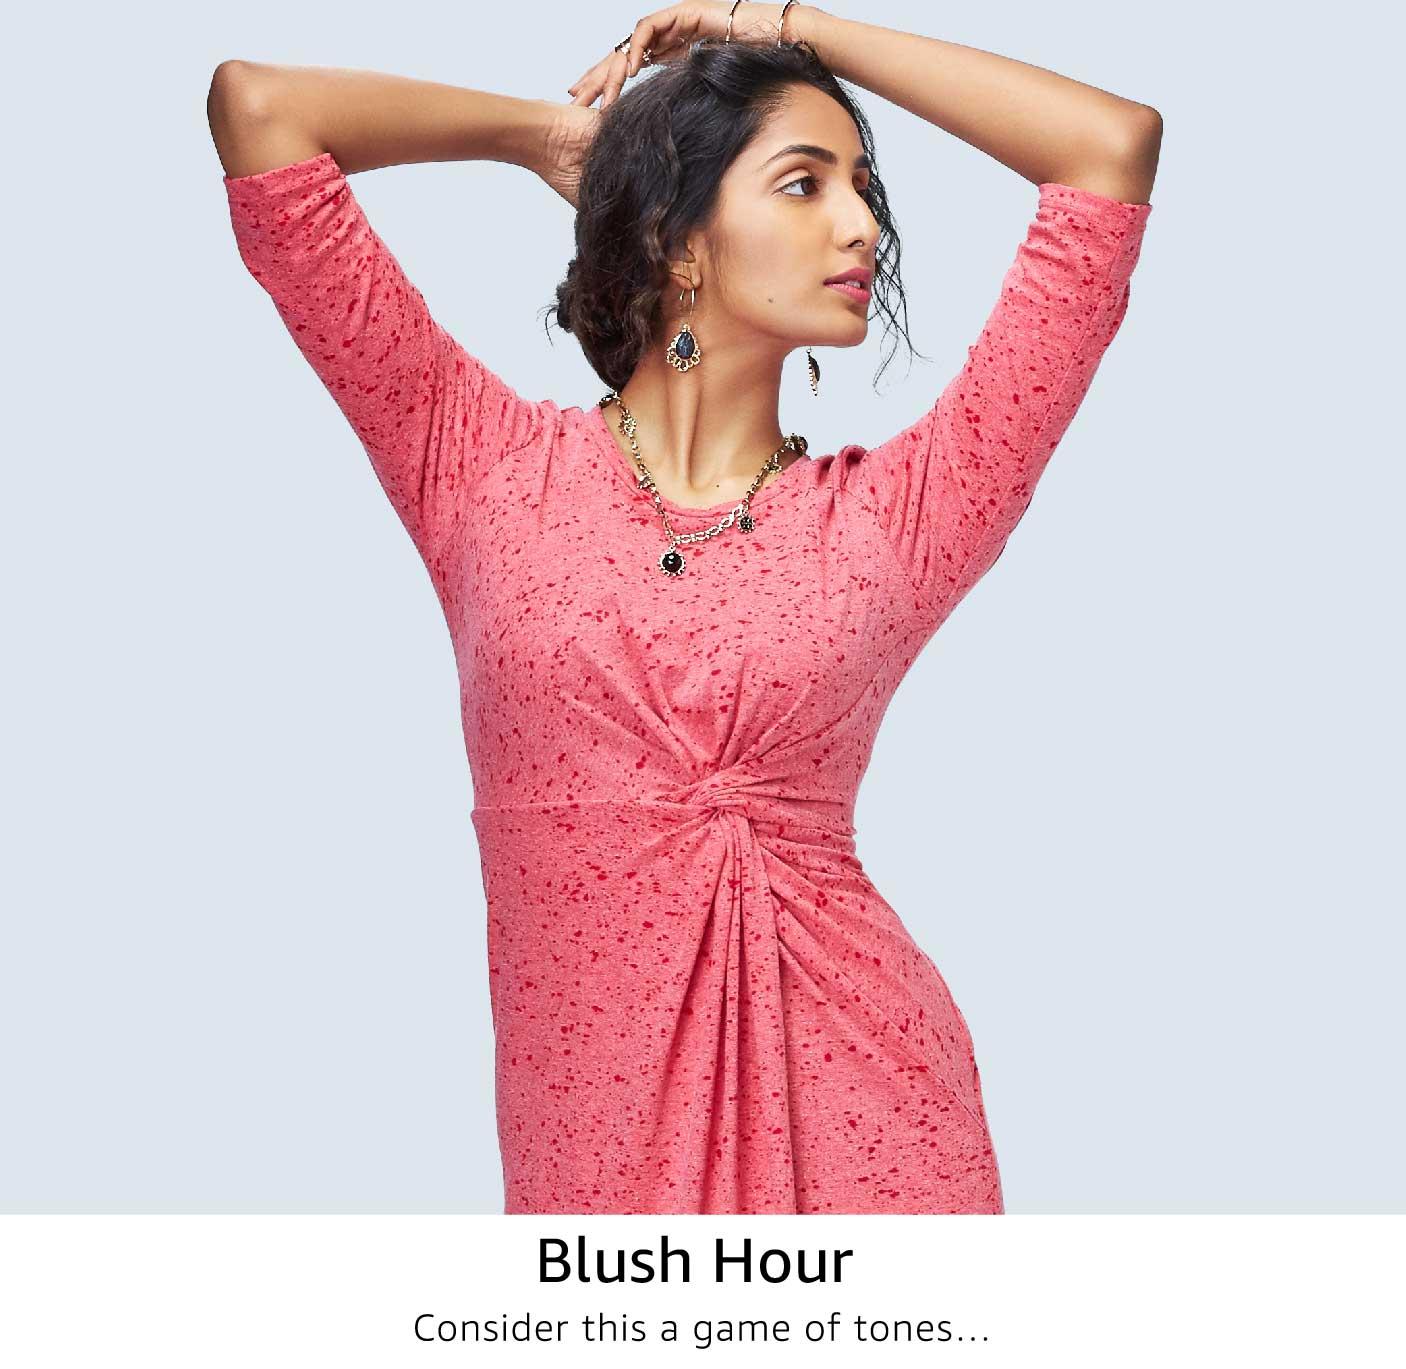 Blush Hour